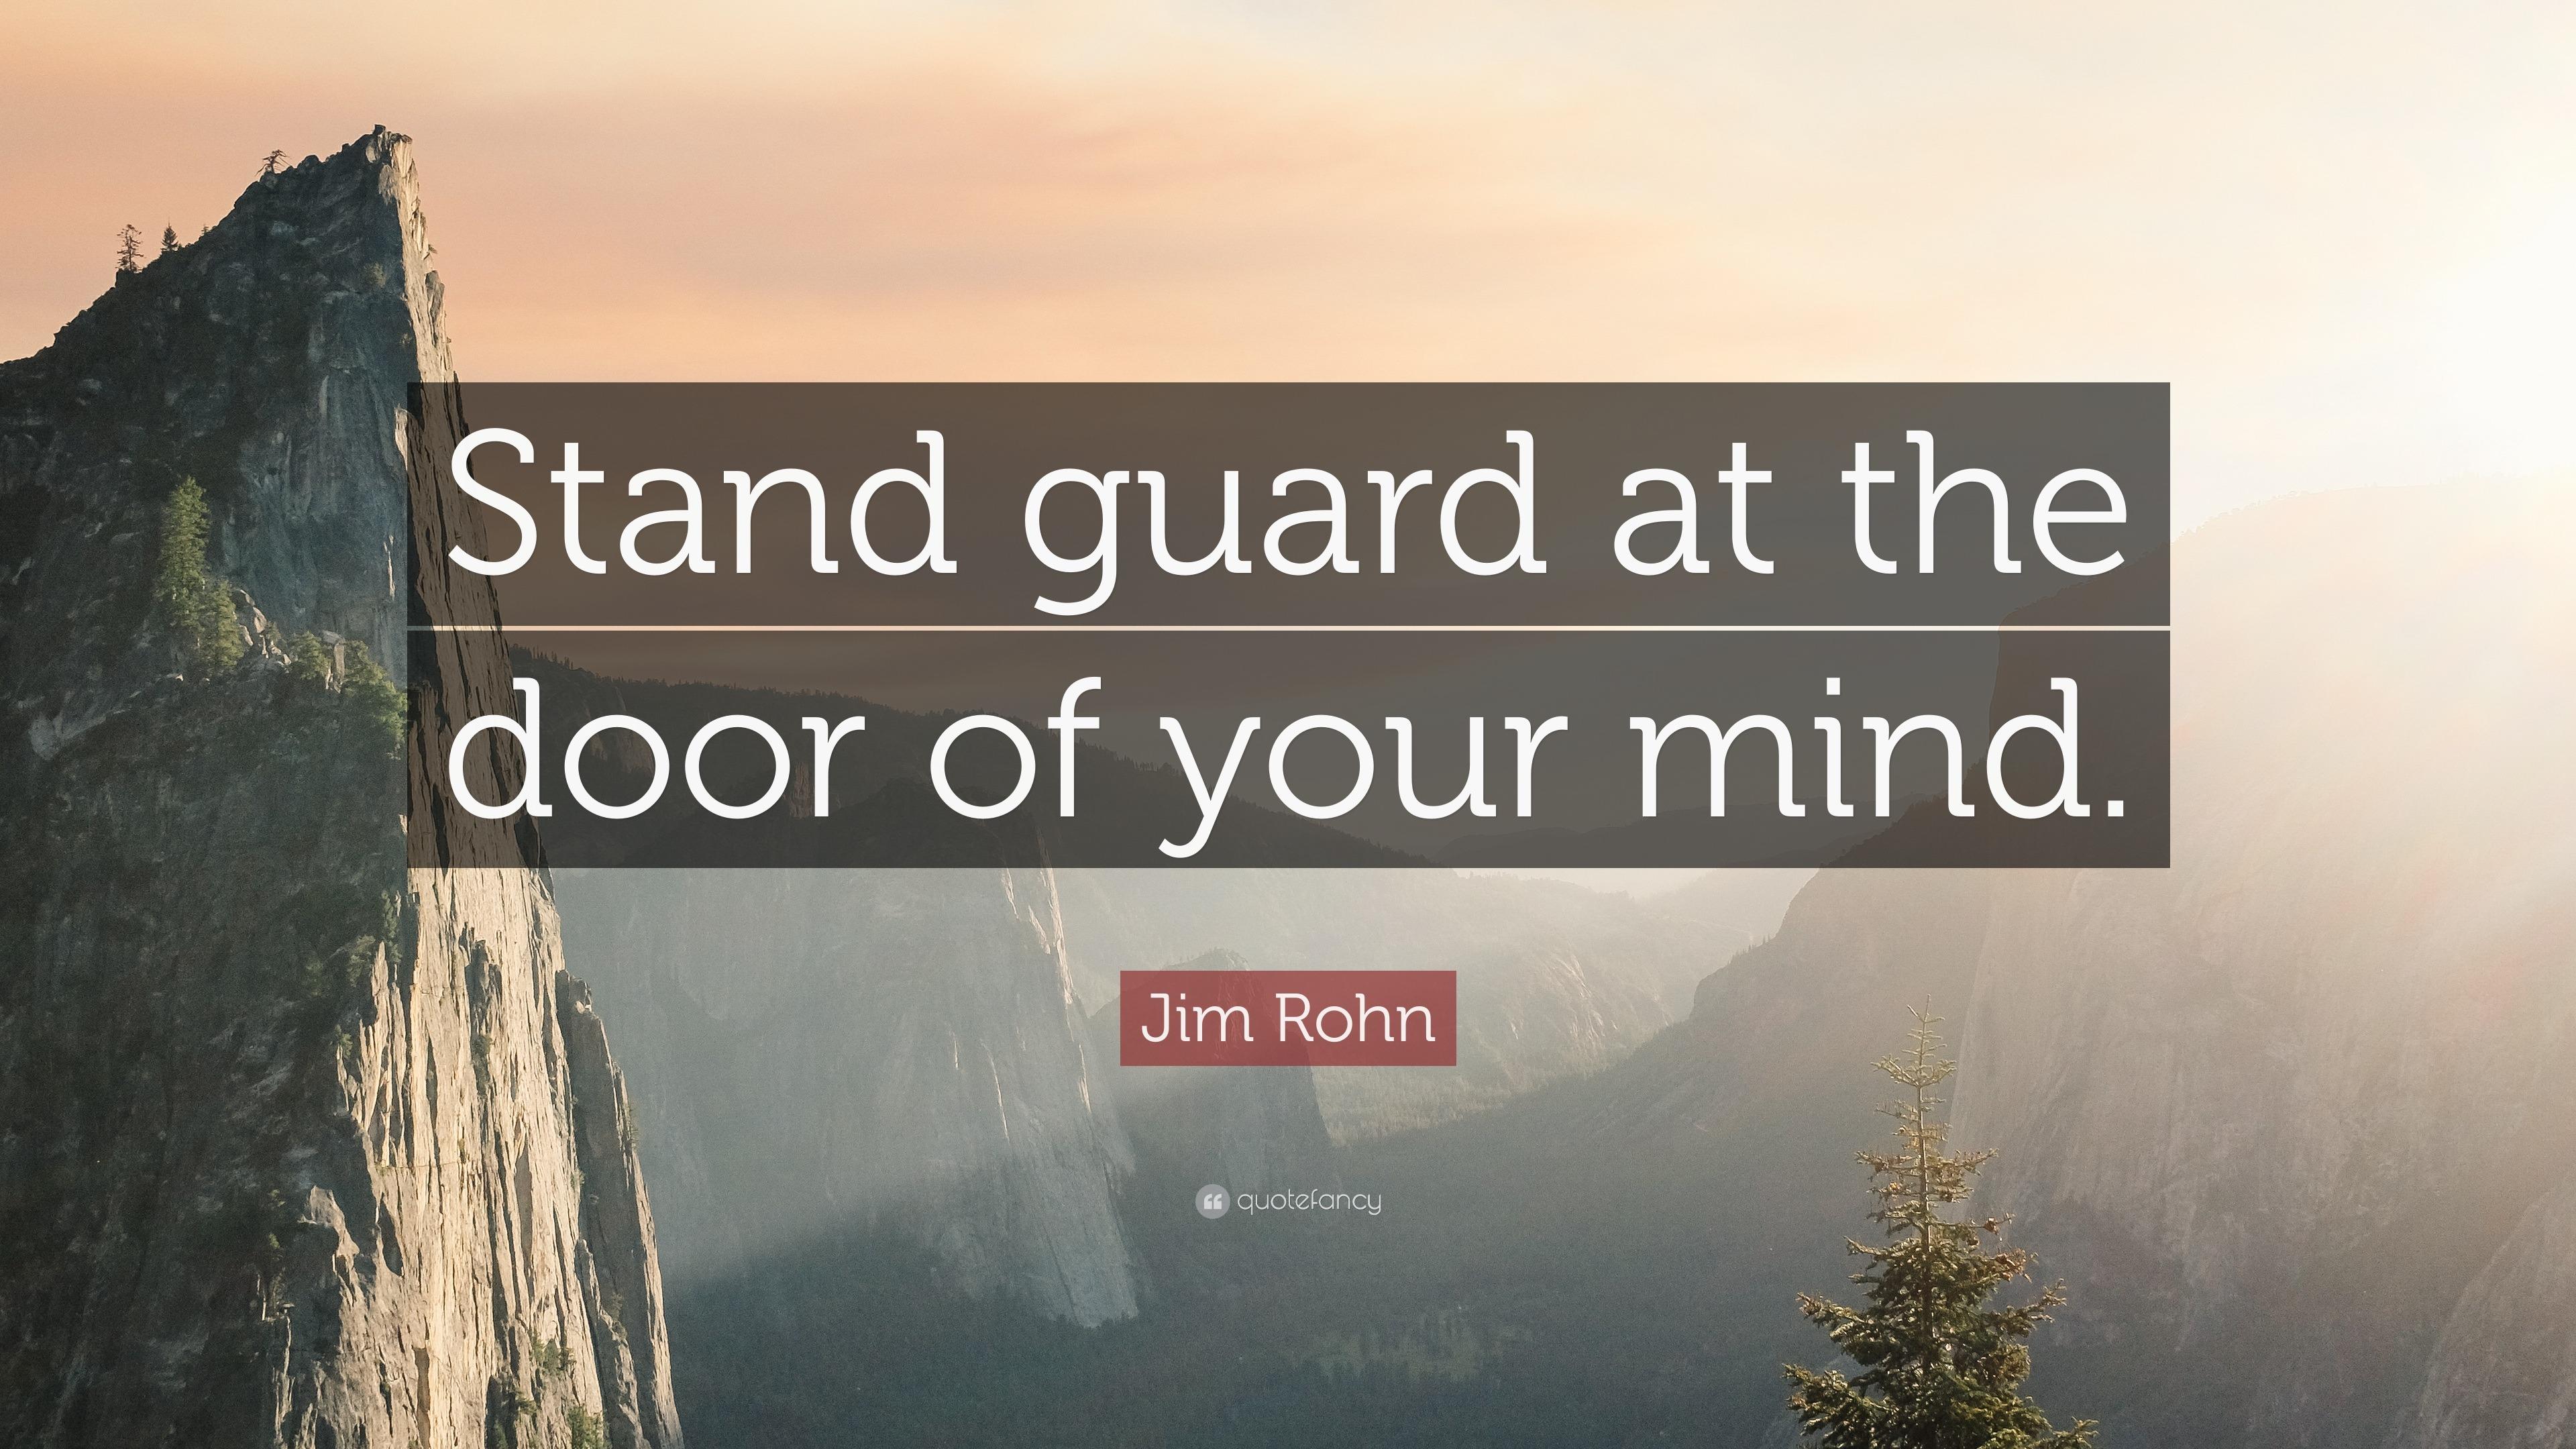 Jim Rohn Quote \u201cStand guard at the door of your mind.\u201d & Jim Rohn Quote: \u201cStand guard at the door of your mind.\u201d (12 ...